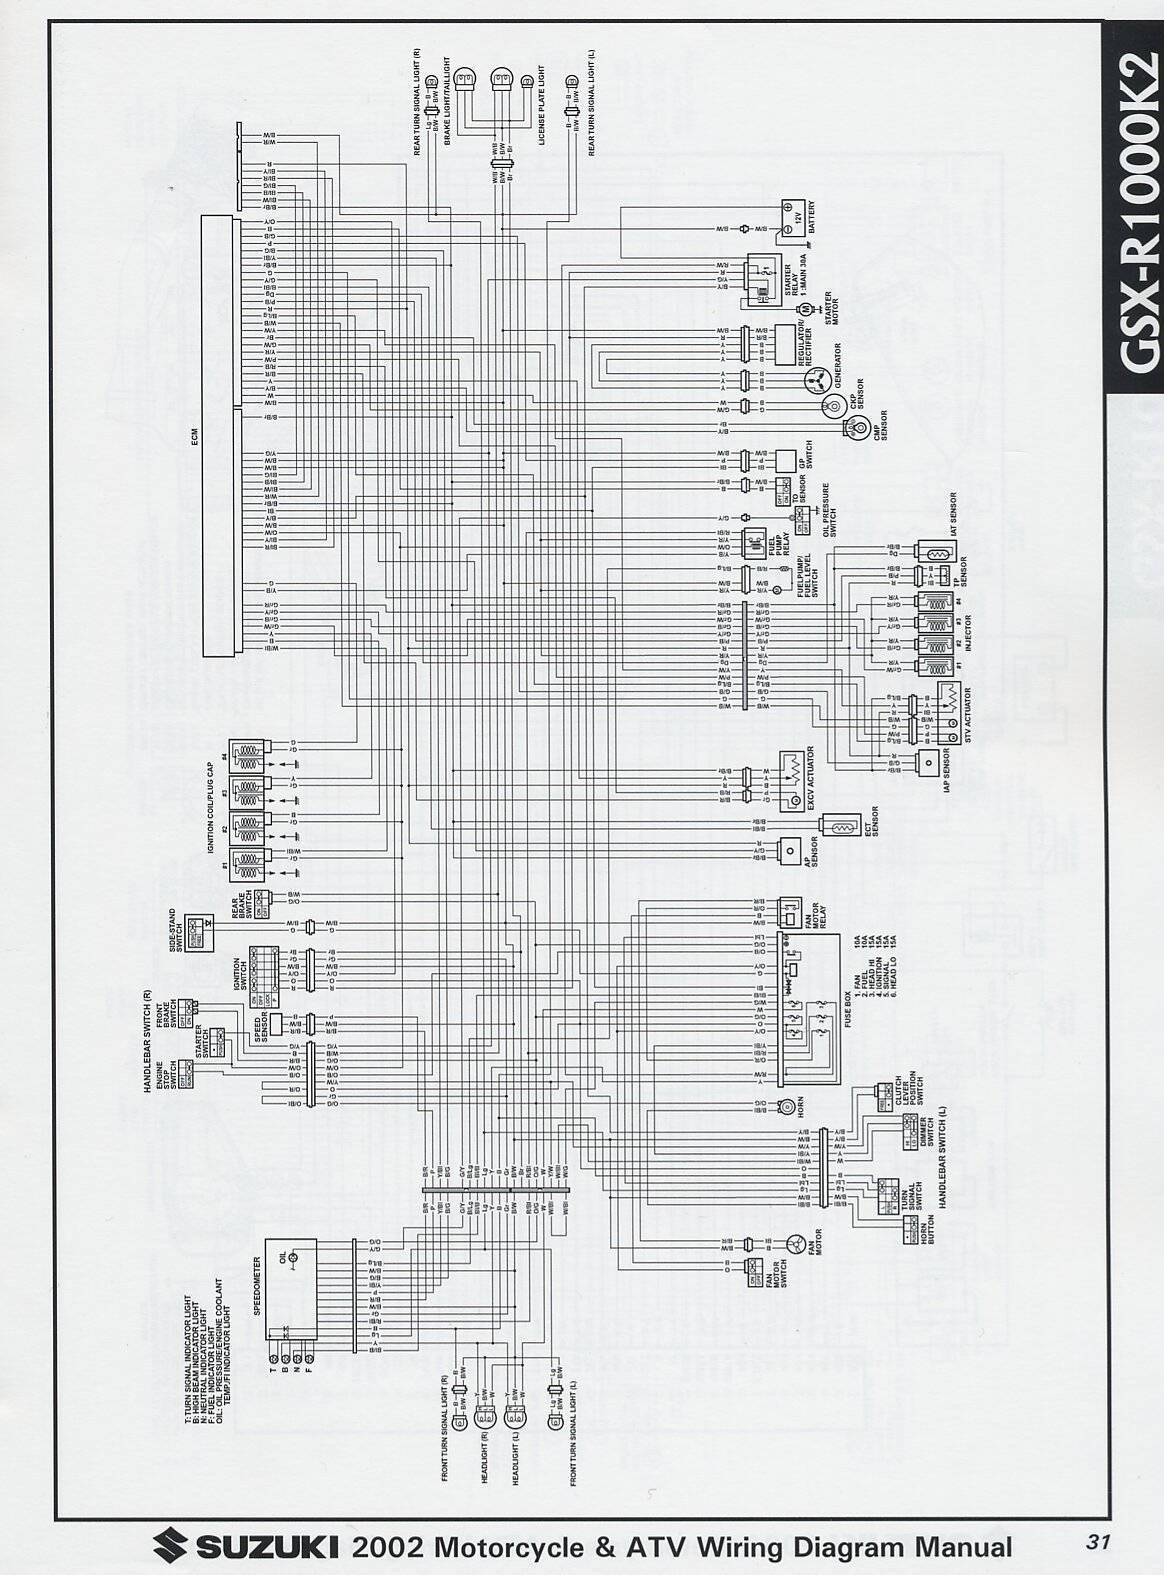 [DIAGRAM_5FD]  SE_0226] 1997 Gsxr Wiring Diagram | 1997 Gsxr 750 Tachometer Wiring Diagram |  | Aryon Pila Props Eumqu Tivexi Kumb Denli Mohammedshrine Librar Wiring 101